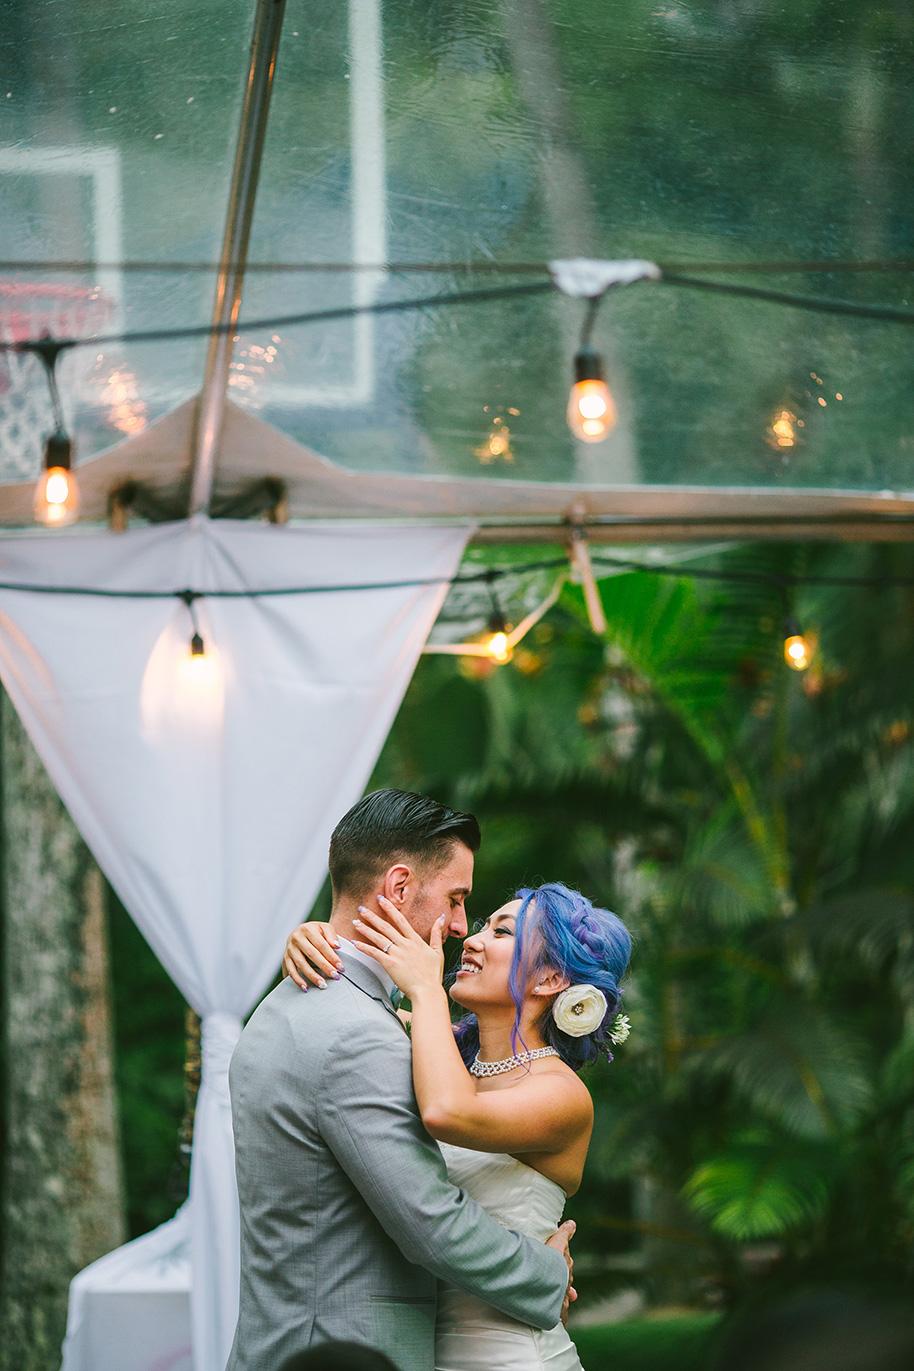 Private-Estate-Wedding-030817-30.jpg